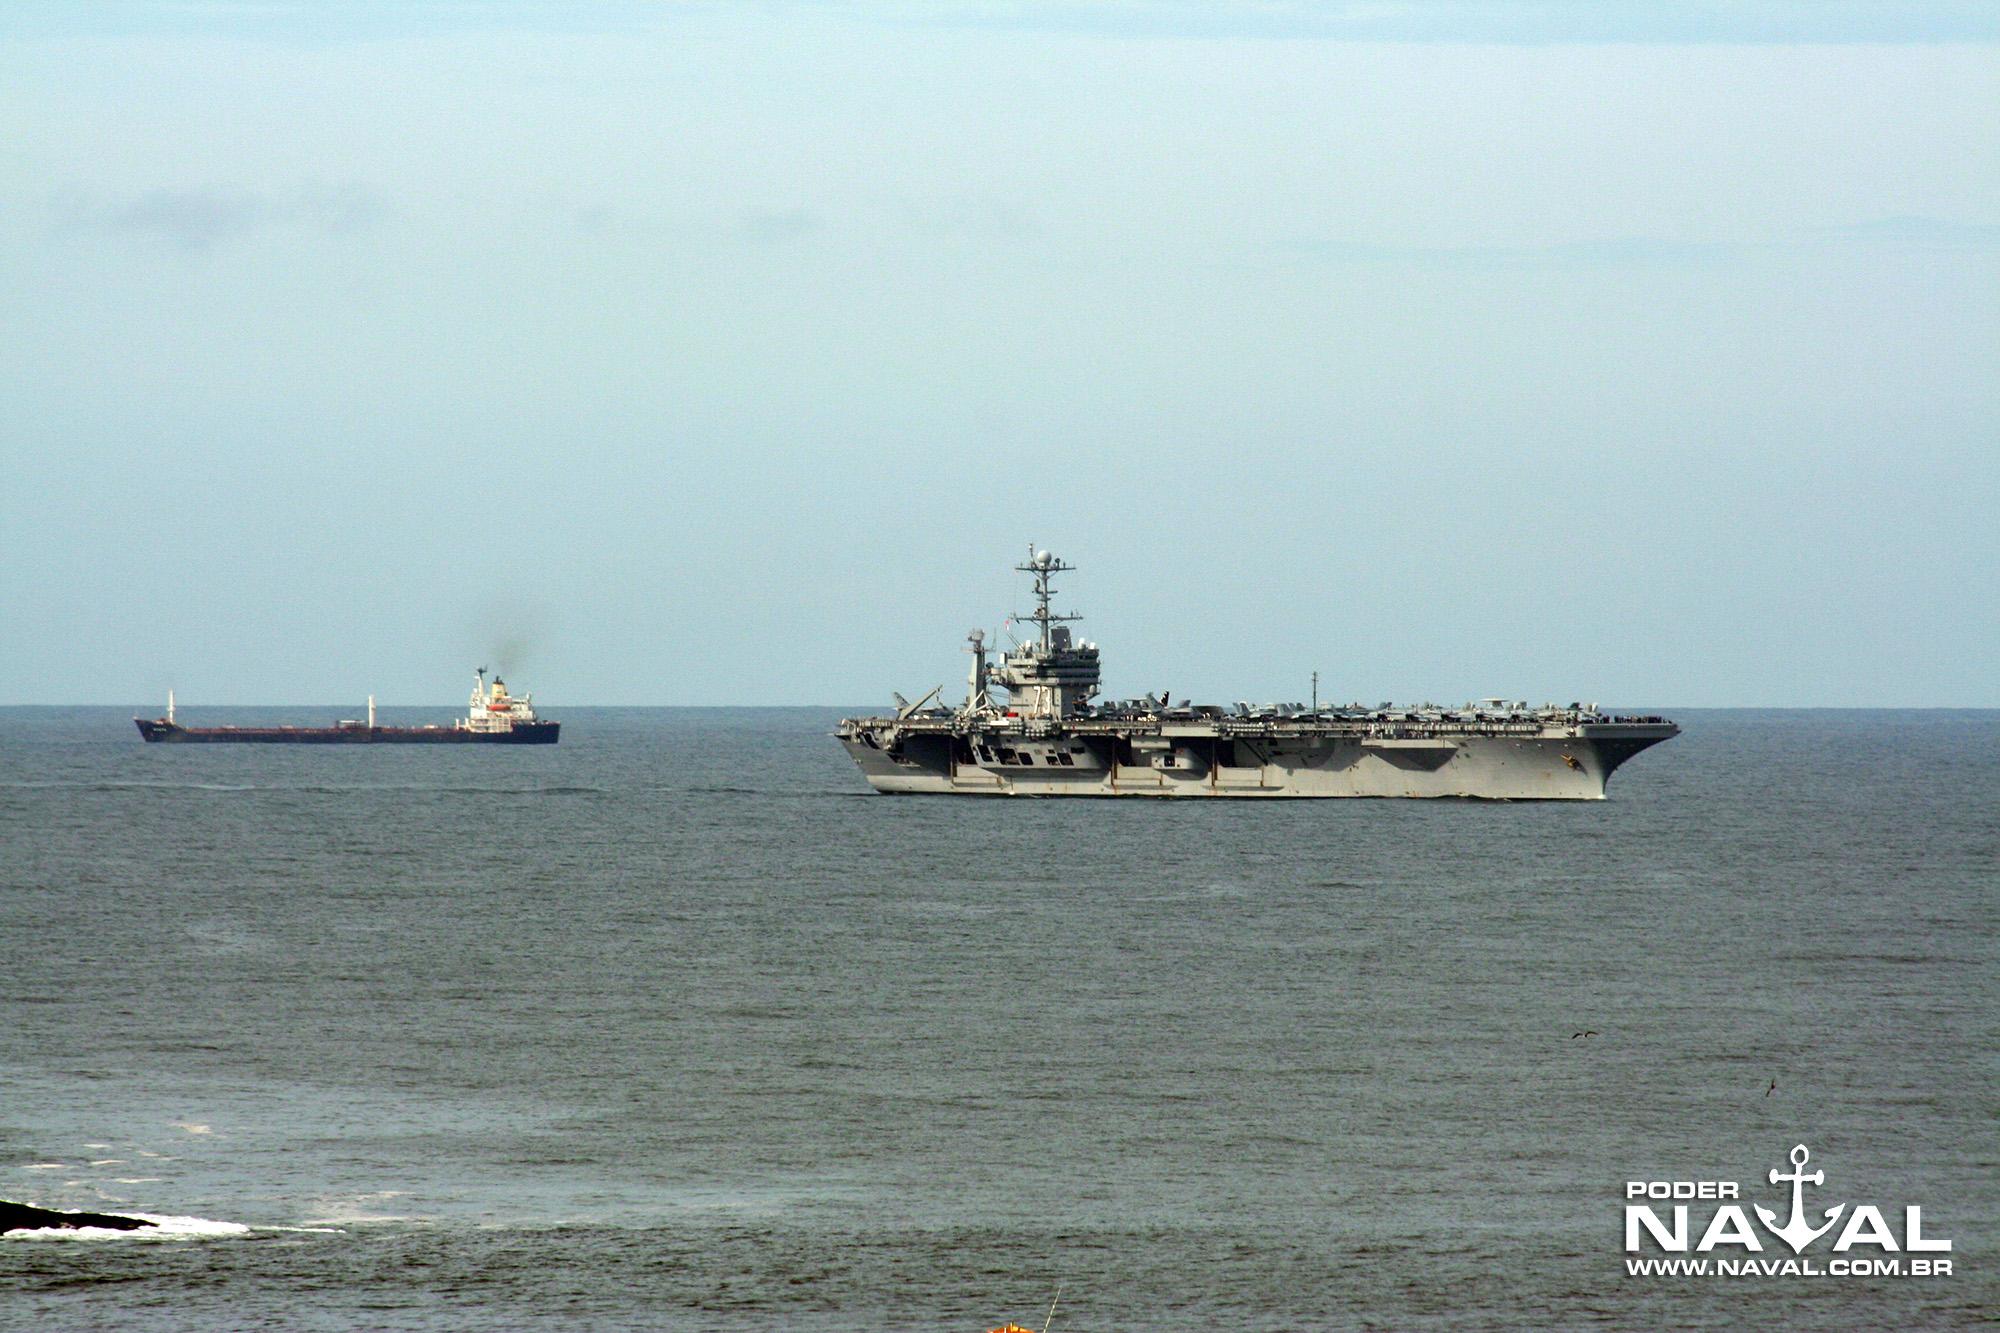 USS George Washington (CVN-73) no Rio - 2008 - 2